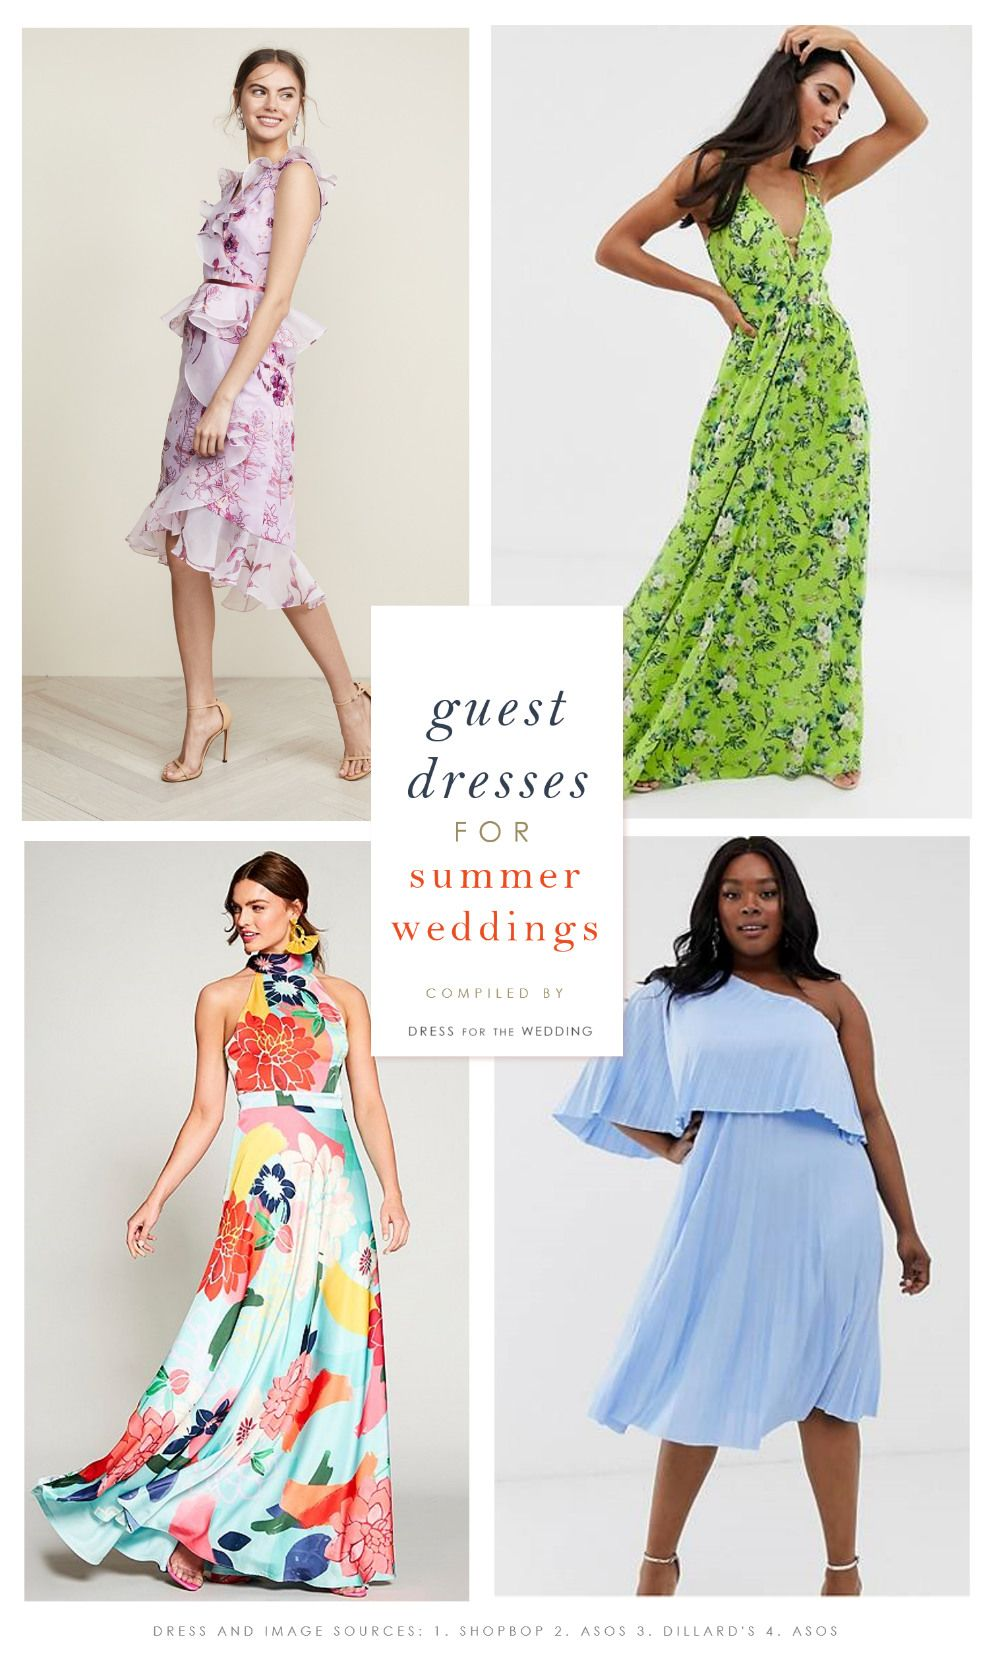 The Best Summer Dresses To Wear To Summer Weddings Summer Wedding Guest Dresses For Wedding Guest Dress Summer Wedding Guest Dress Styles Wedding Guest Dress